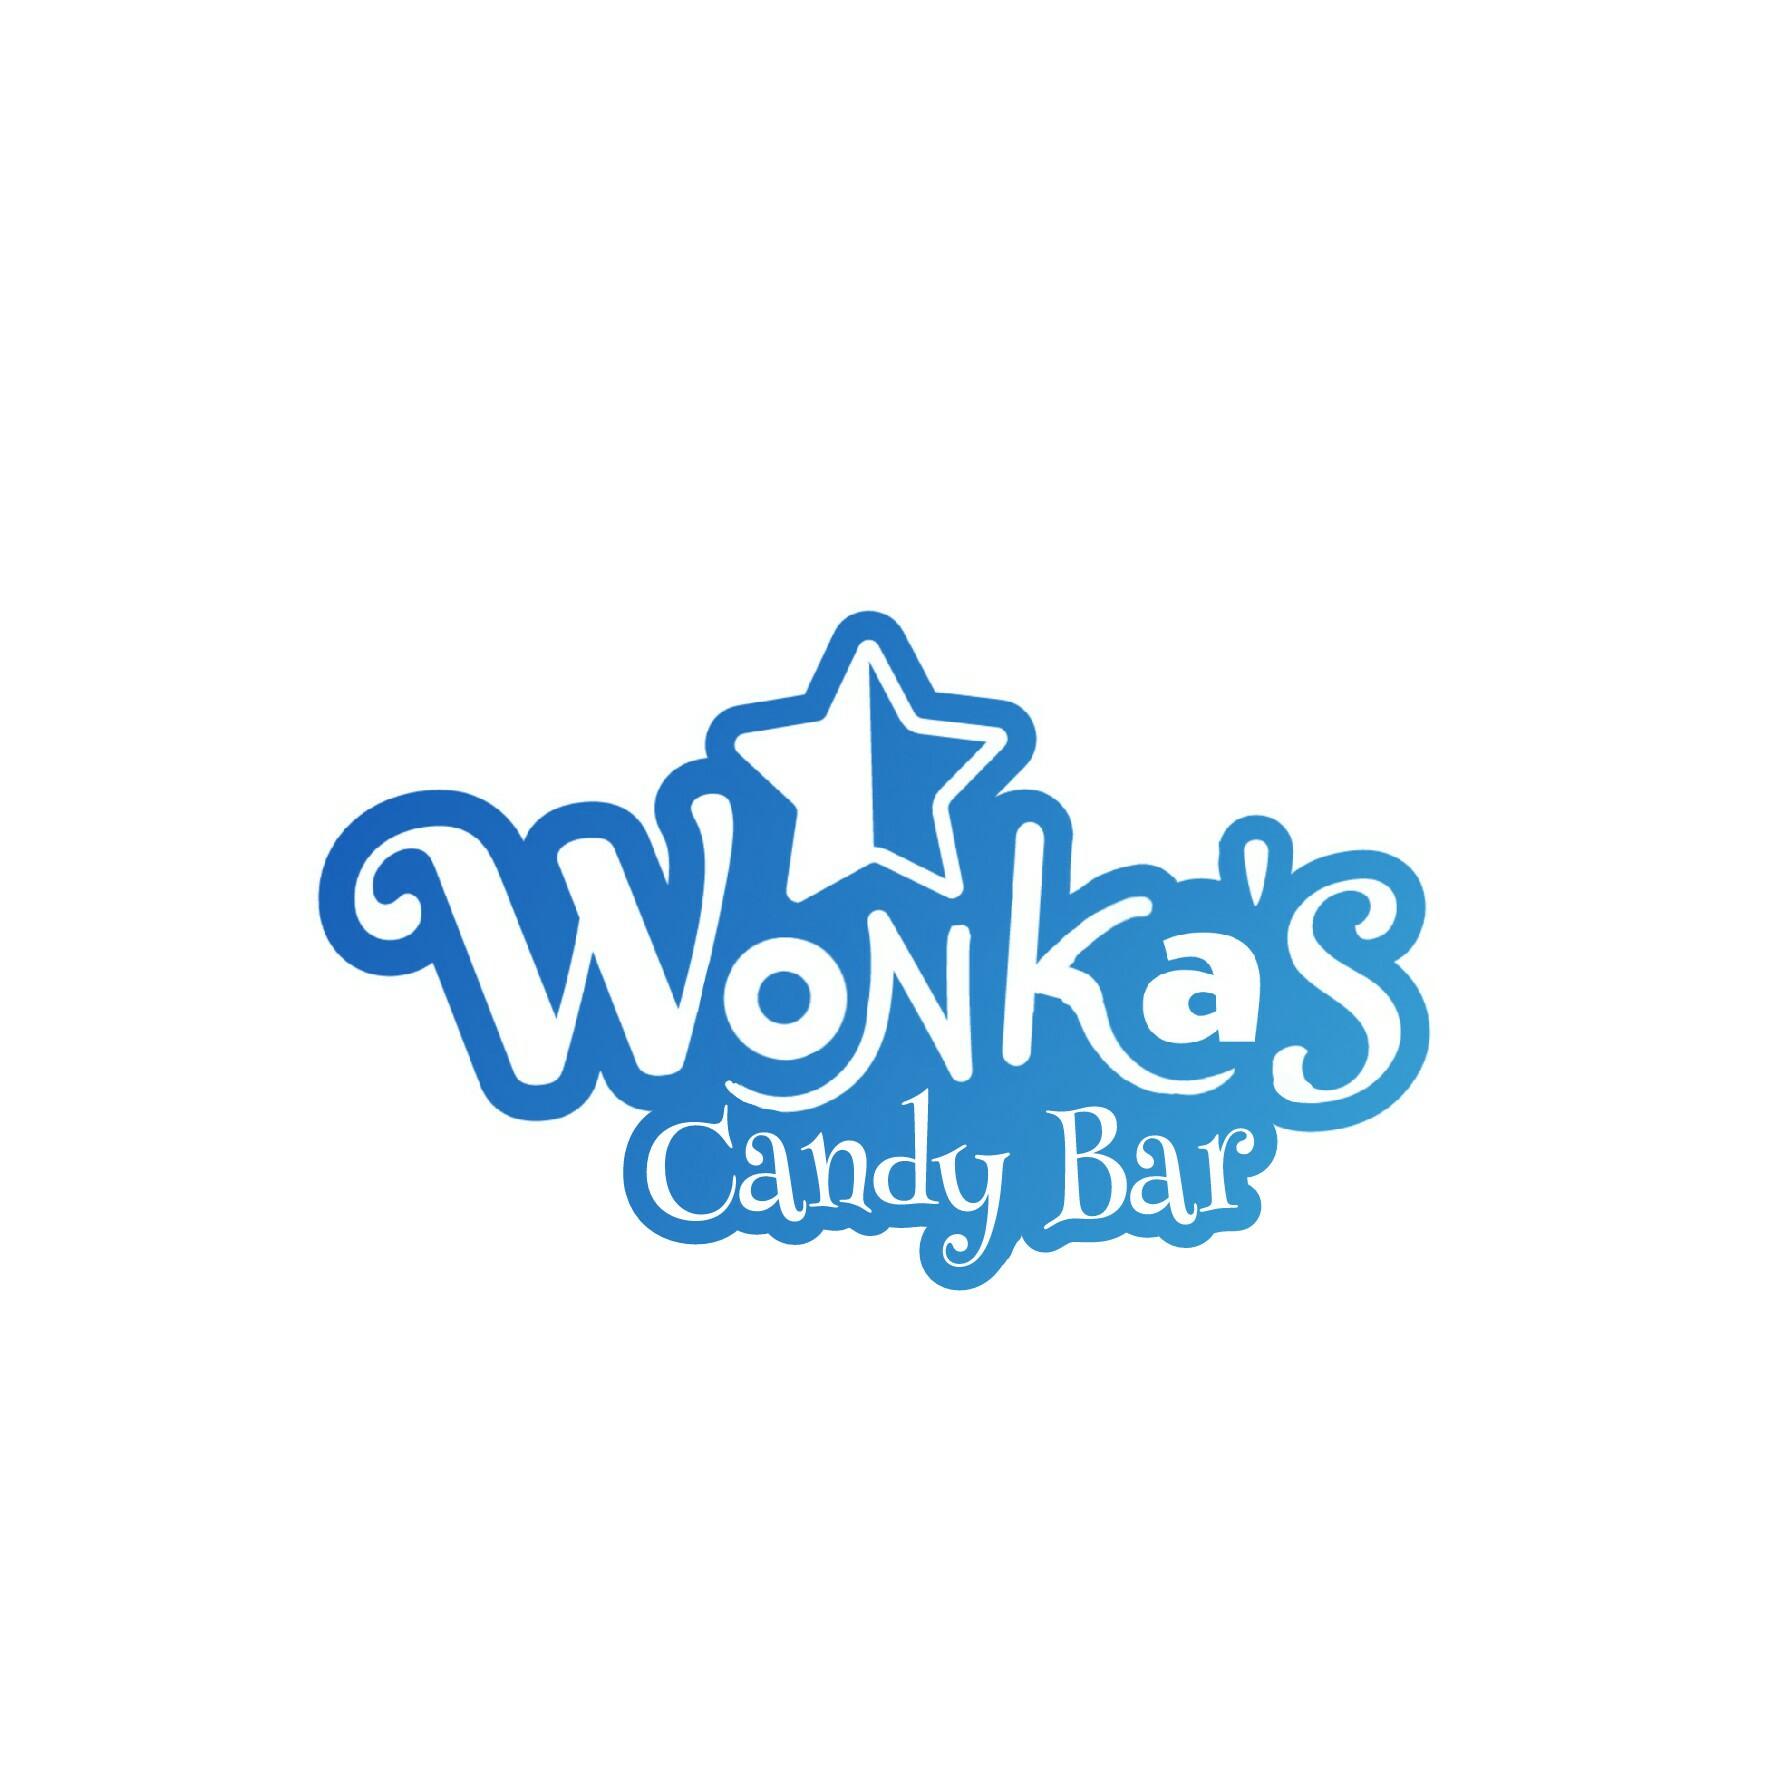 Разработка логотипа магазина сладостей со всего мира. фото f_5885a298c9fedf8d.jpg